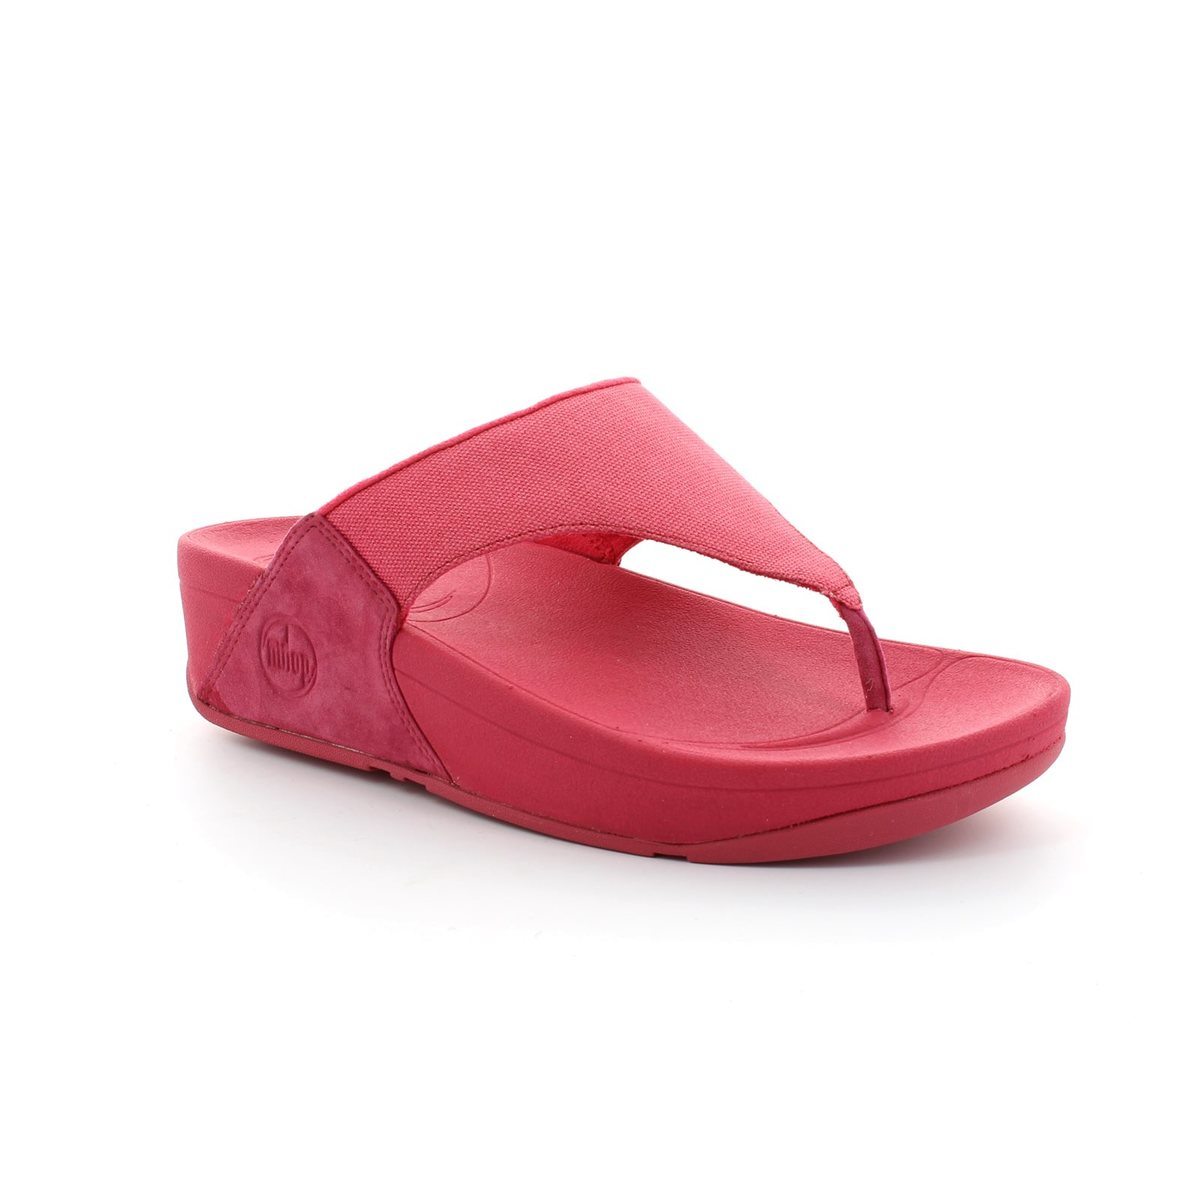 Bedroom Athletics Slippers Usa